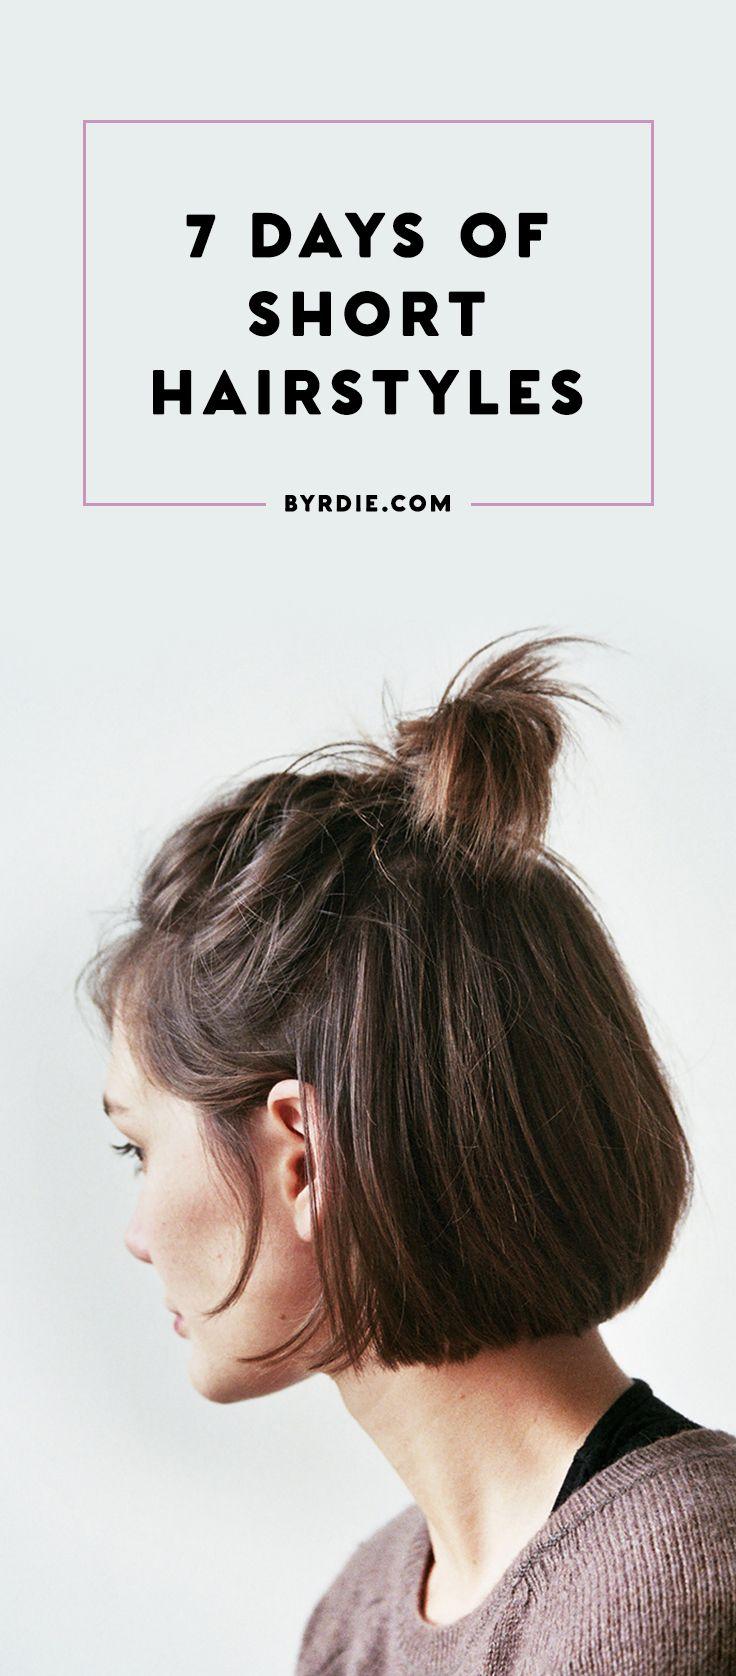 30 Chic Ways To Style Short Hair Short Hair Styles Easy Short Hair Styles Curly Hair Styles